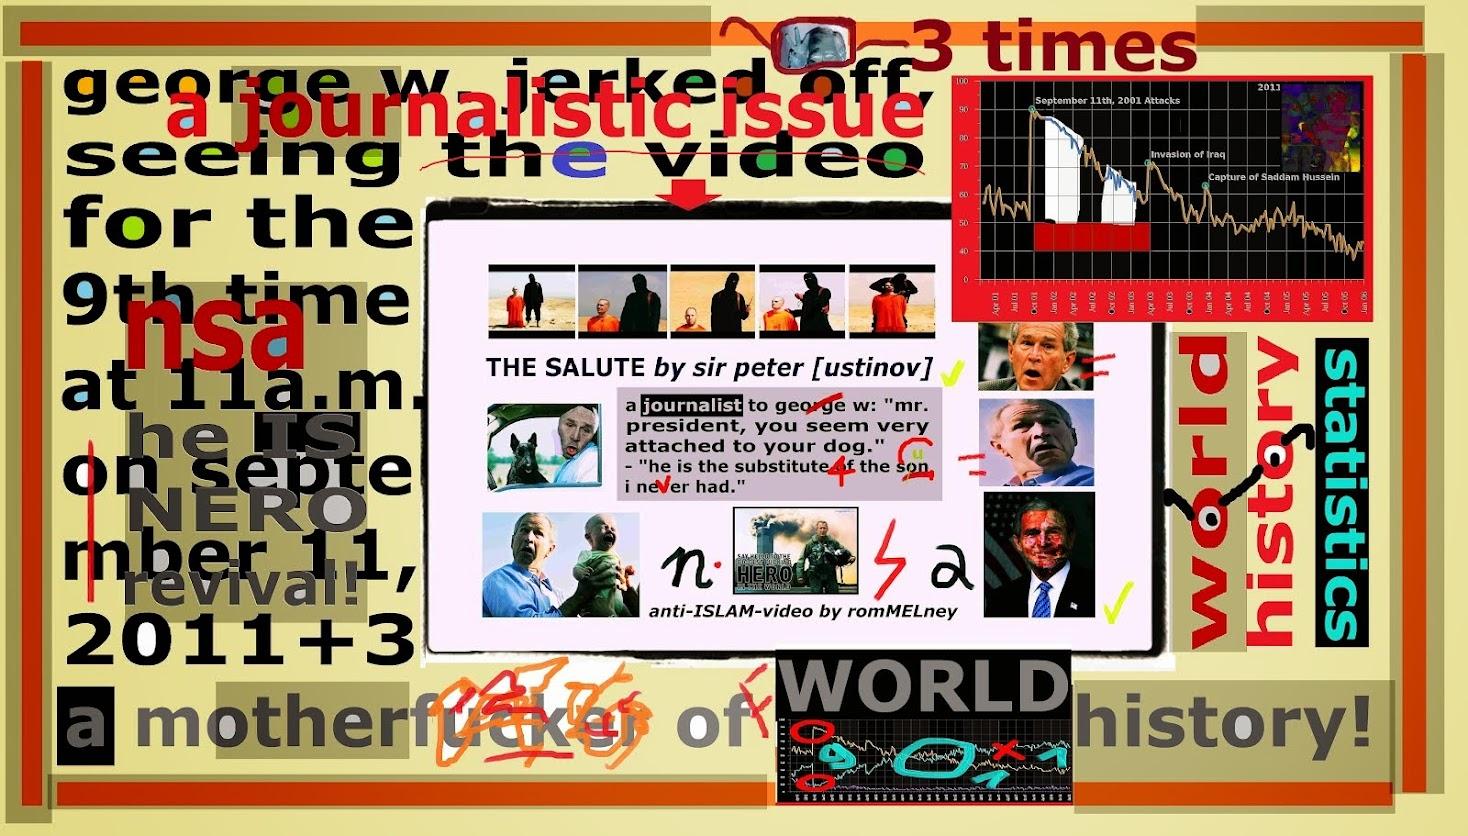 sir peter ustinov VORURTEILE msicha vetere DIE GEISTIGE REVOLUTION nero revival 911 barack obama